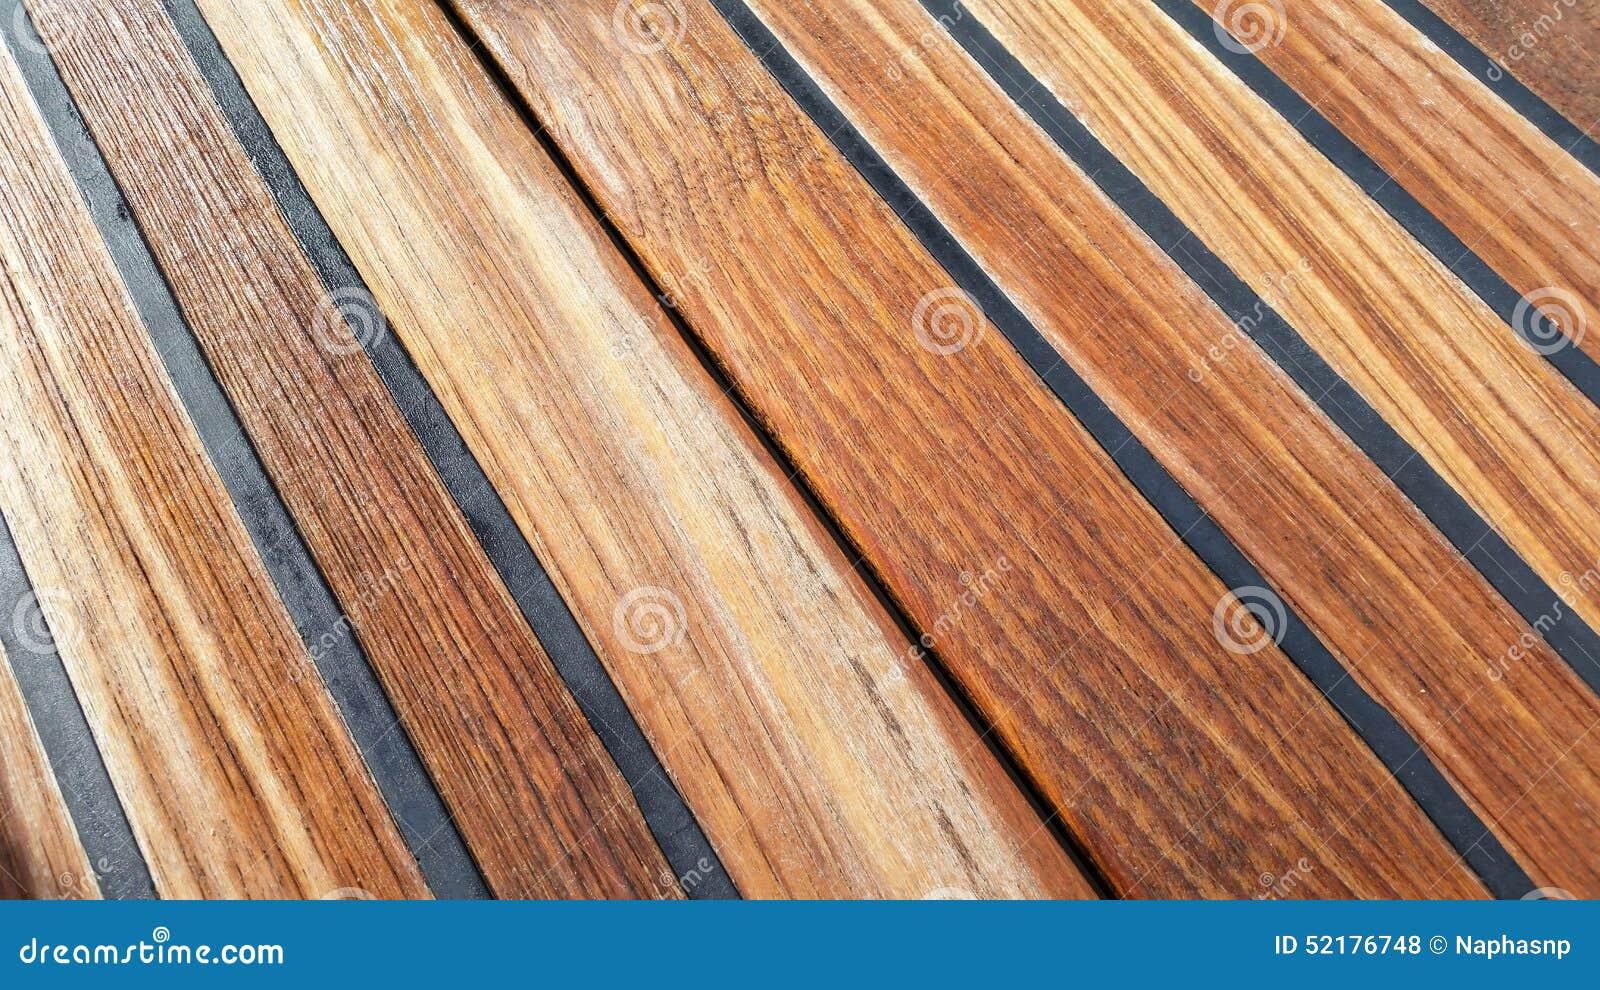 Wet teak deck wallpaper stock photo. Image of deck, background - 52176748